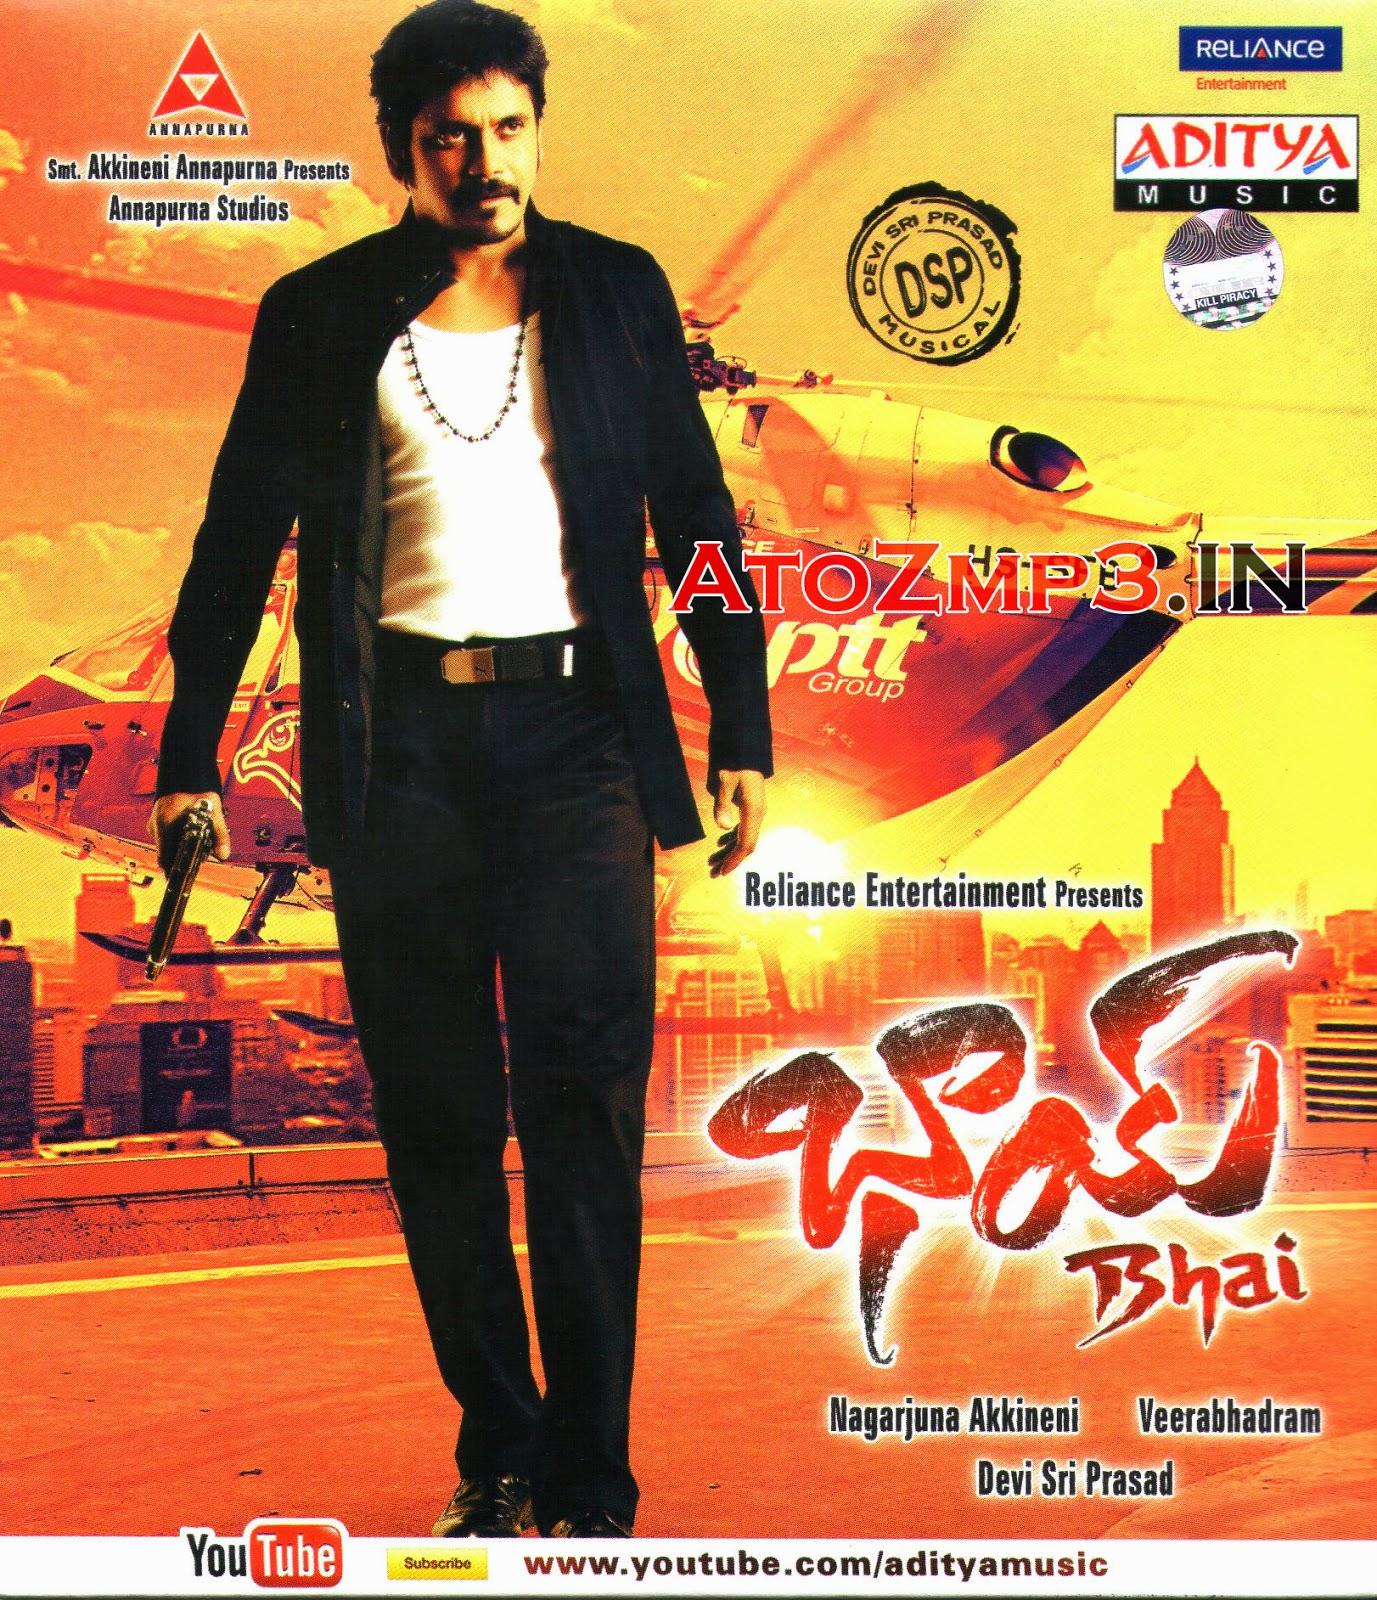 Bhai (2013) Telugu Mp3 Songs Free Download